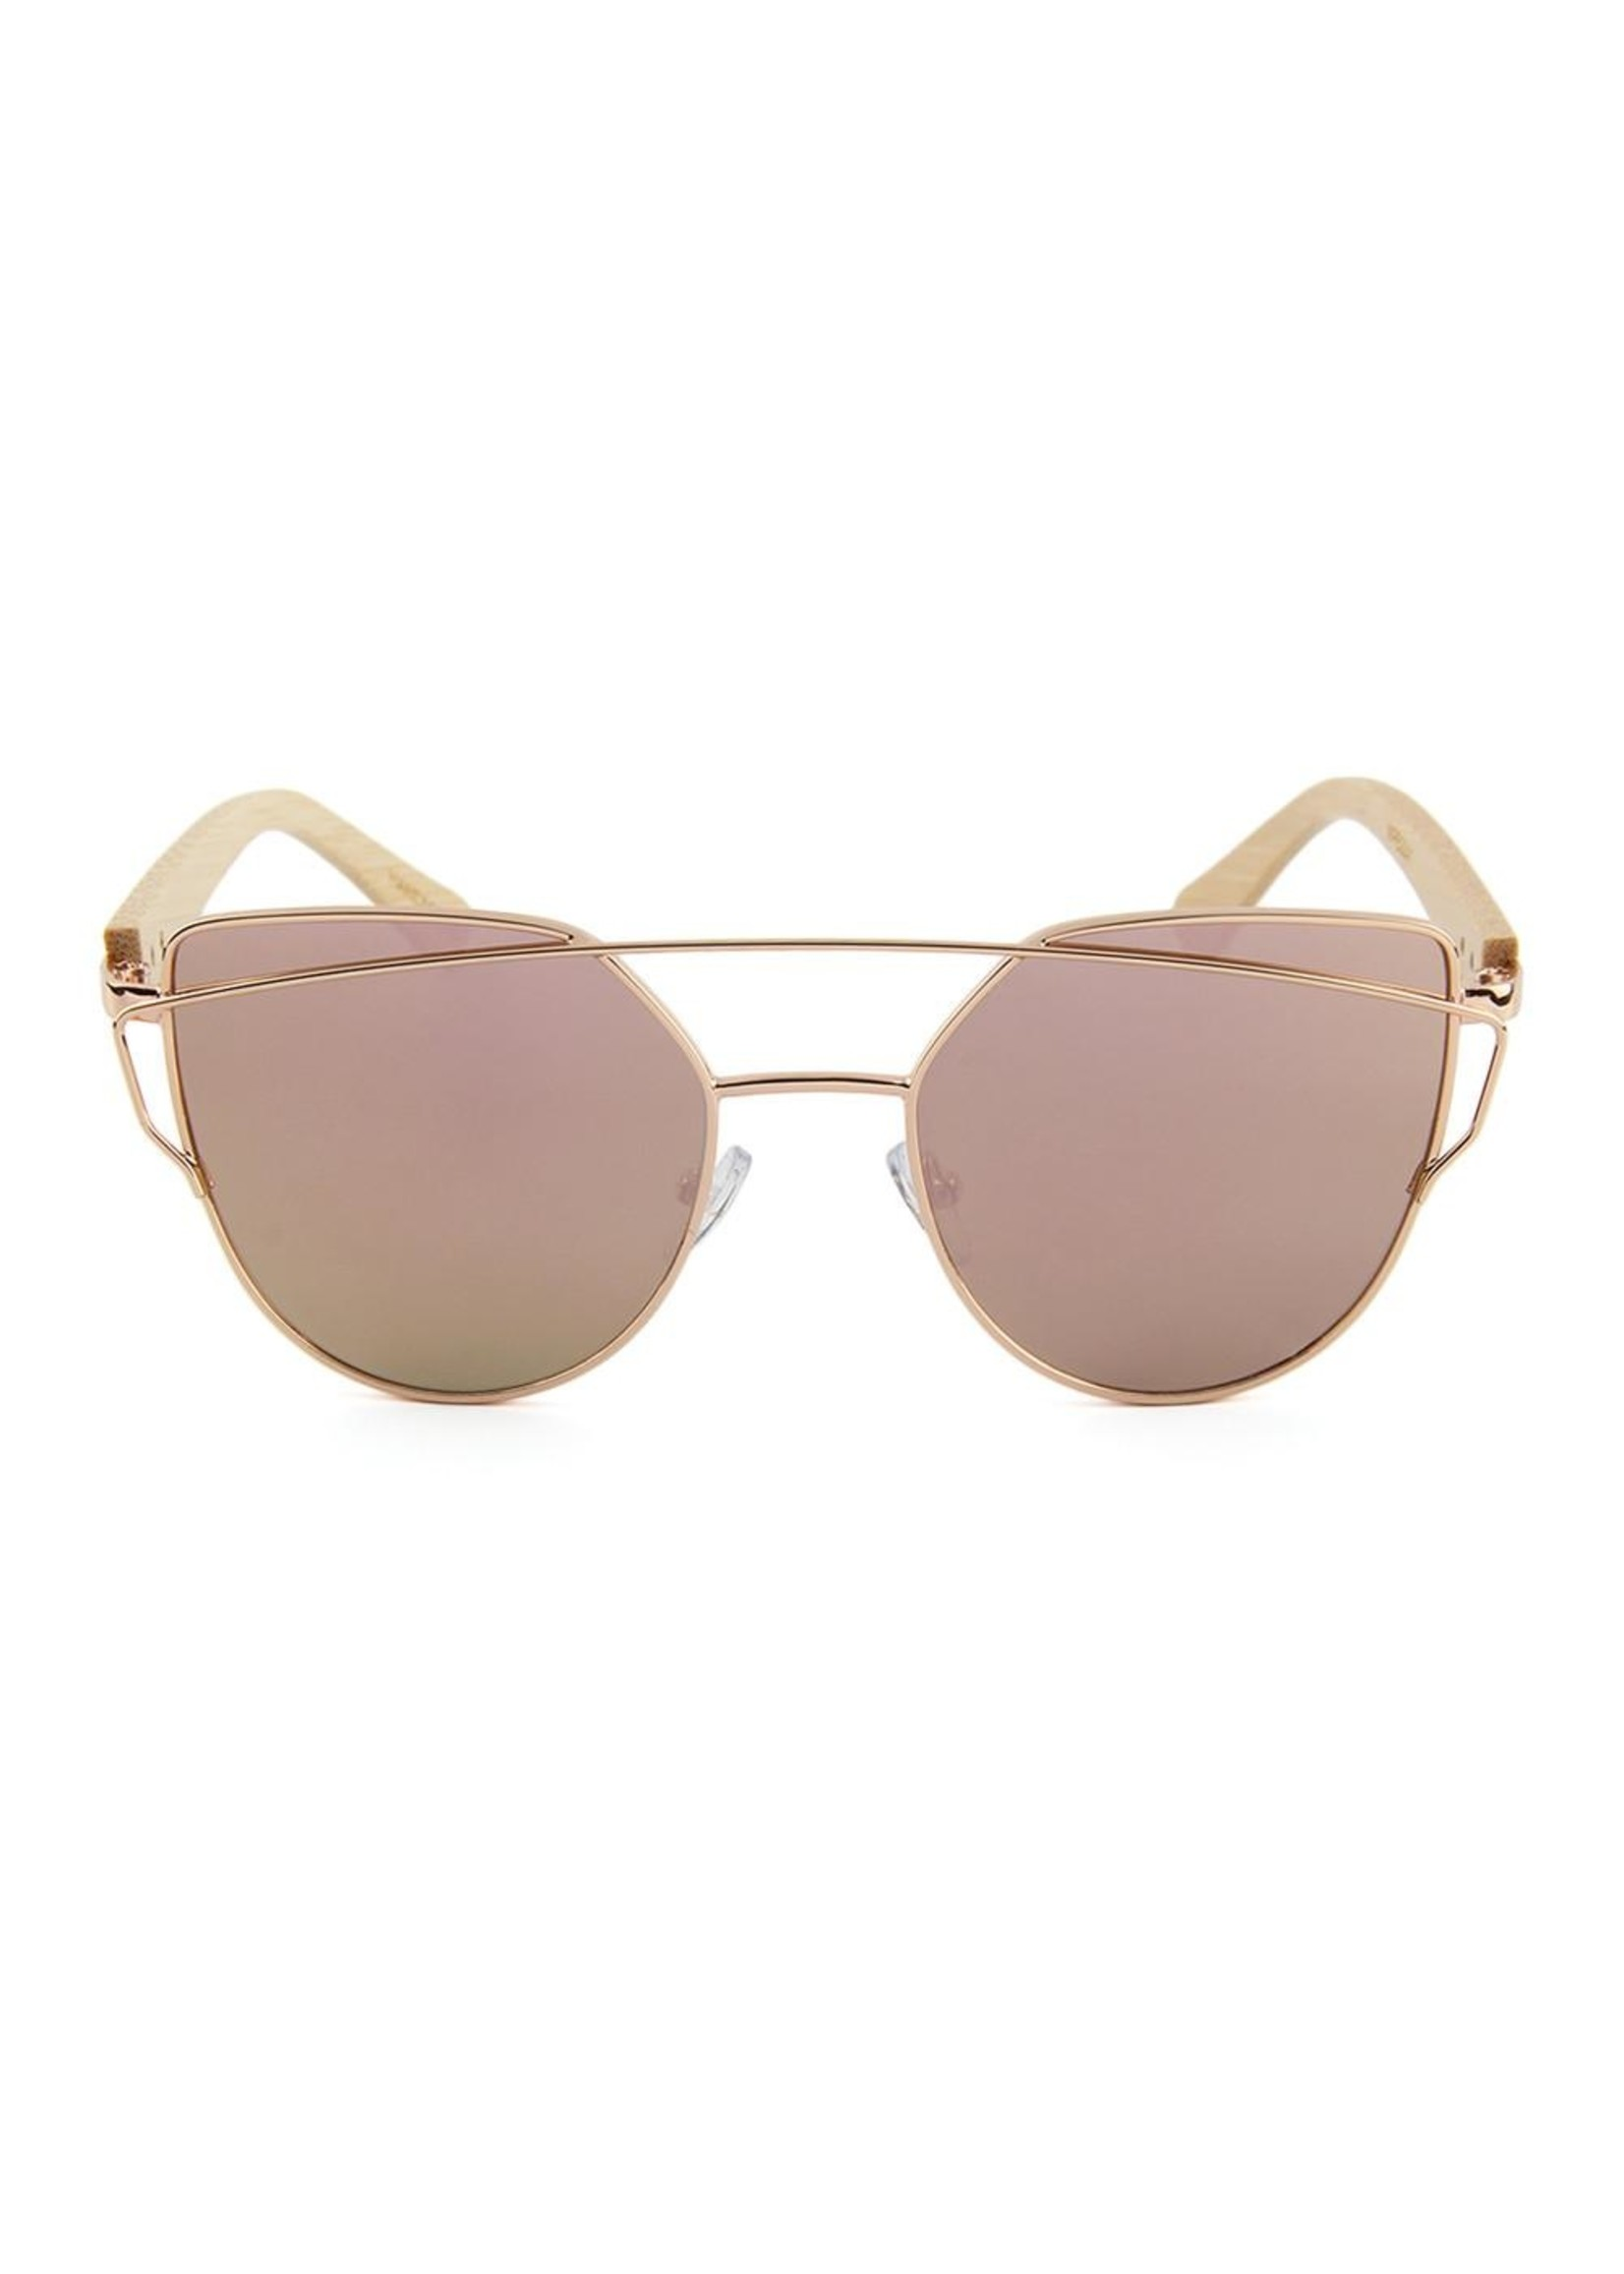 Kuma Sunglasses Olive - Rose Gold